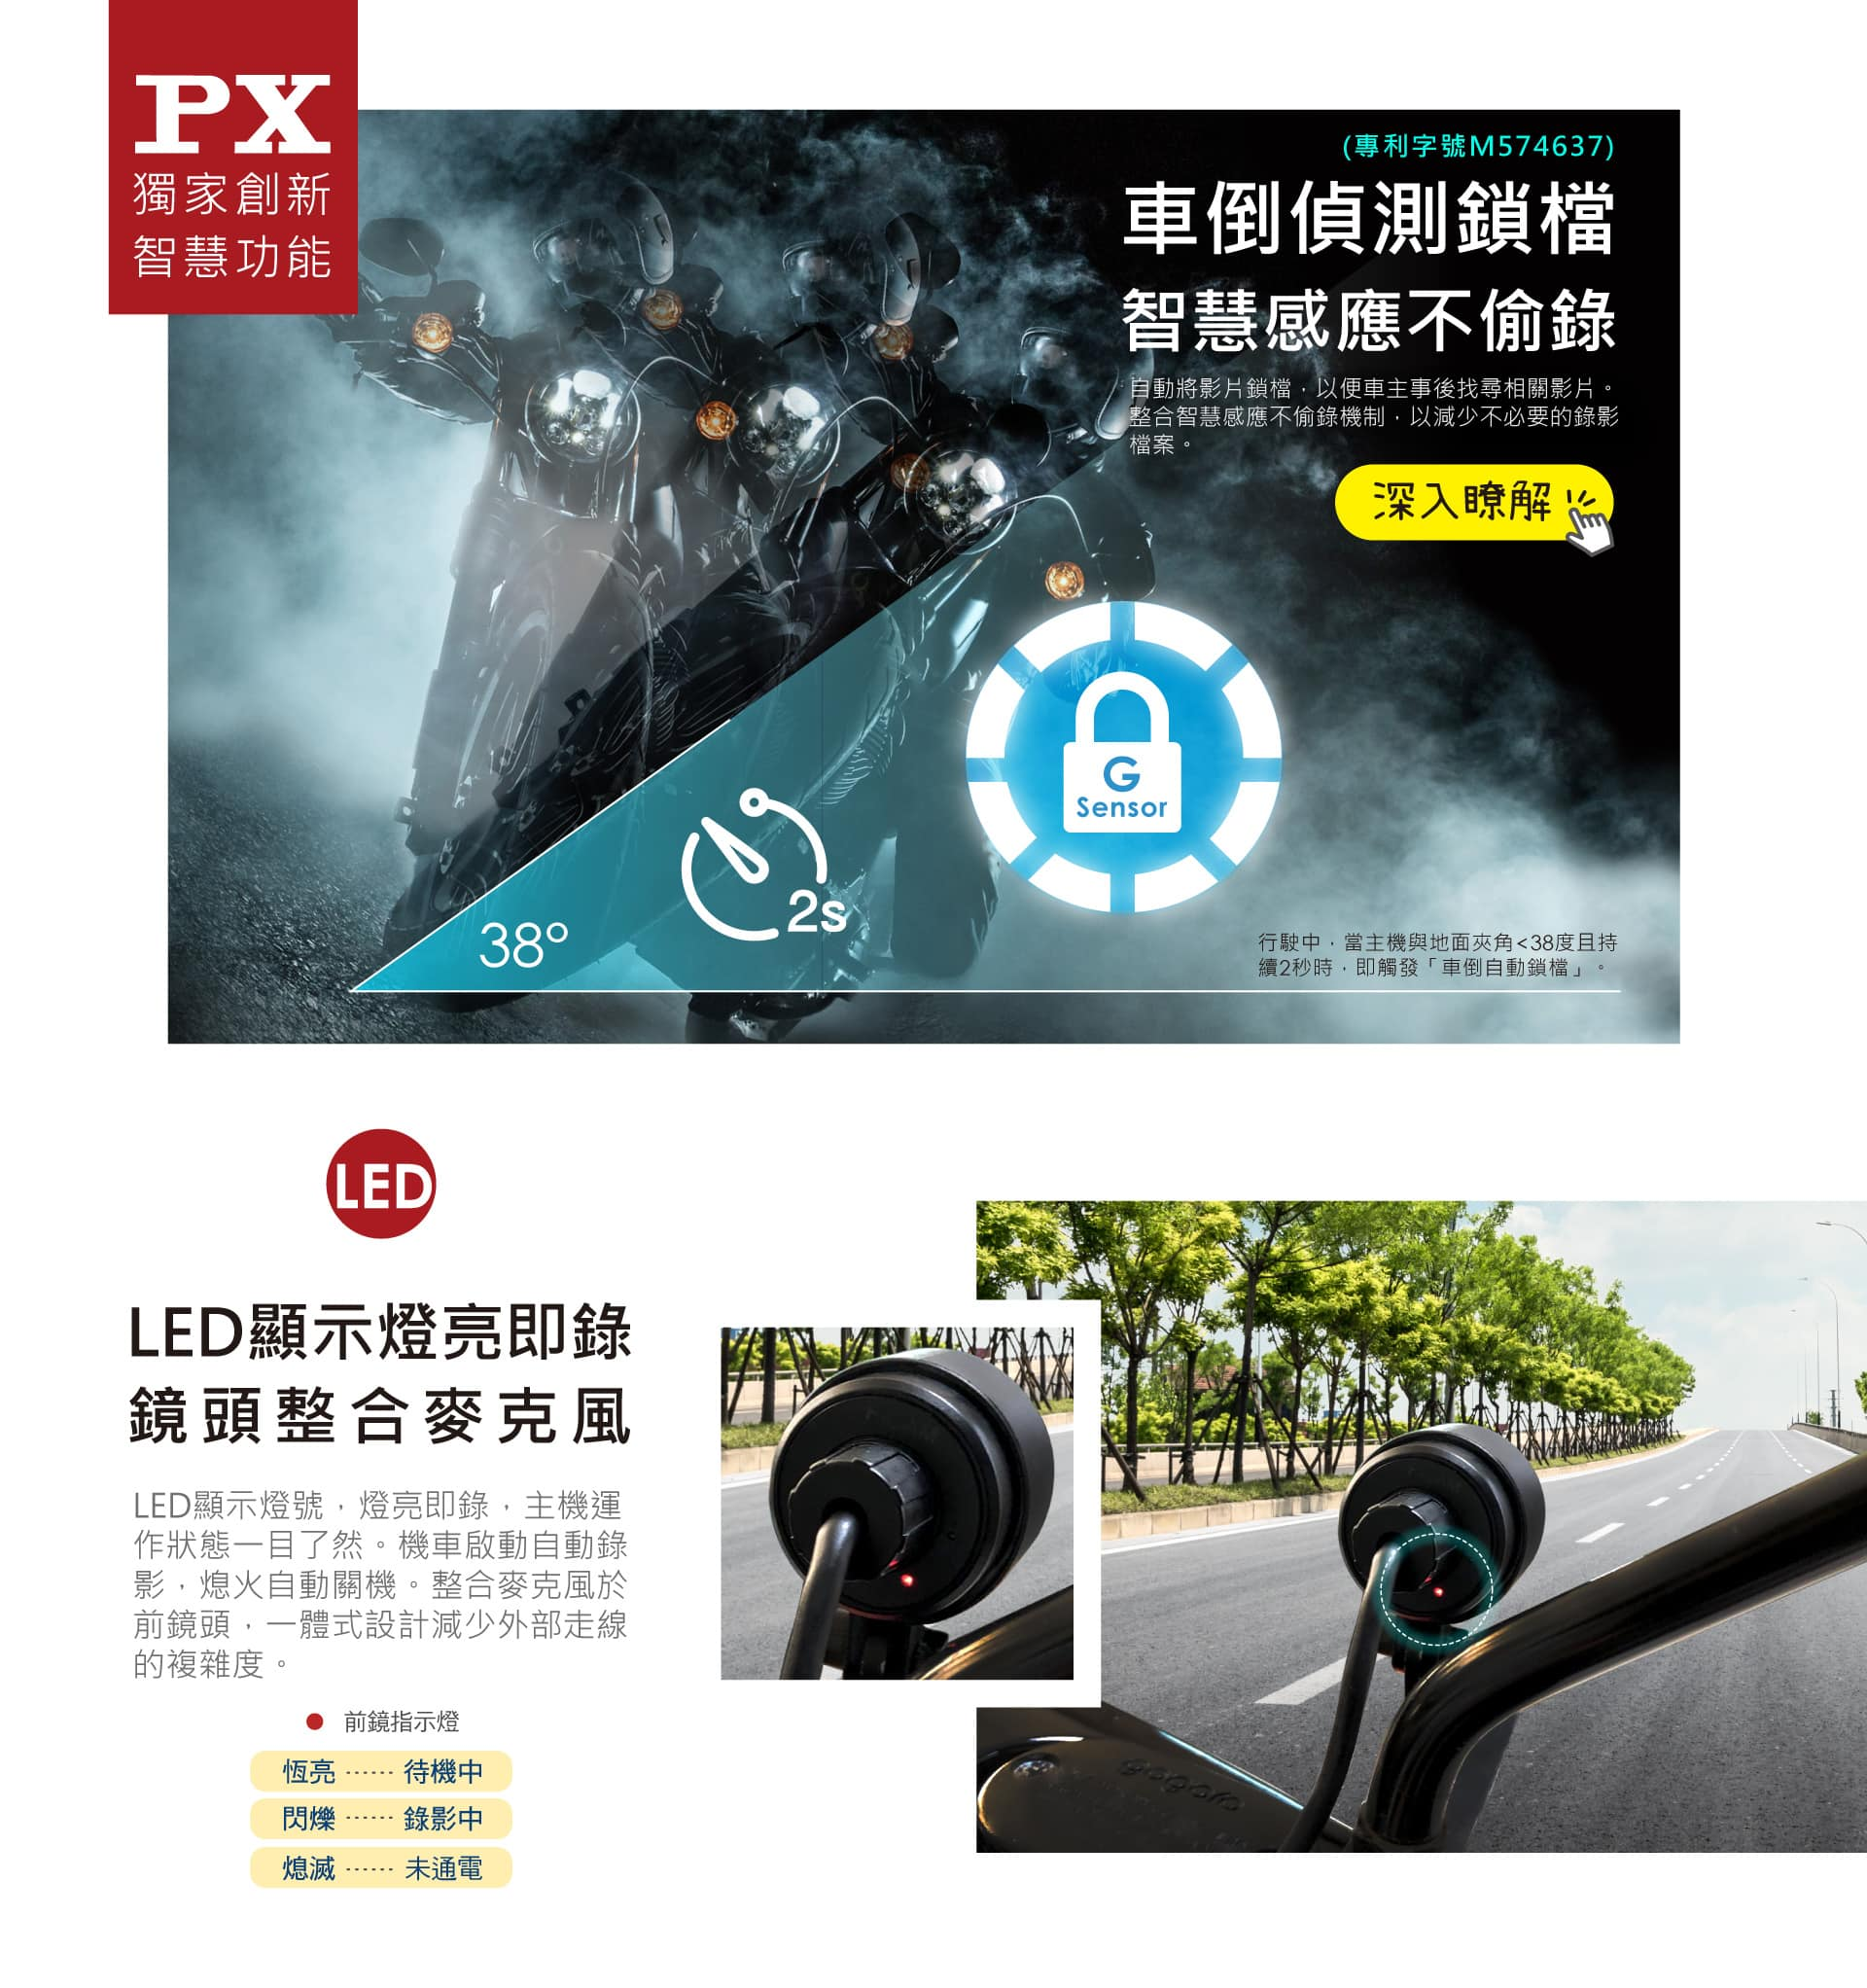 proimages/product/Bike_Cam/PX-GX1_Plus/PX-GX1patent-02.jpg